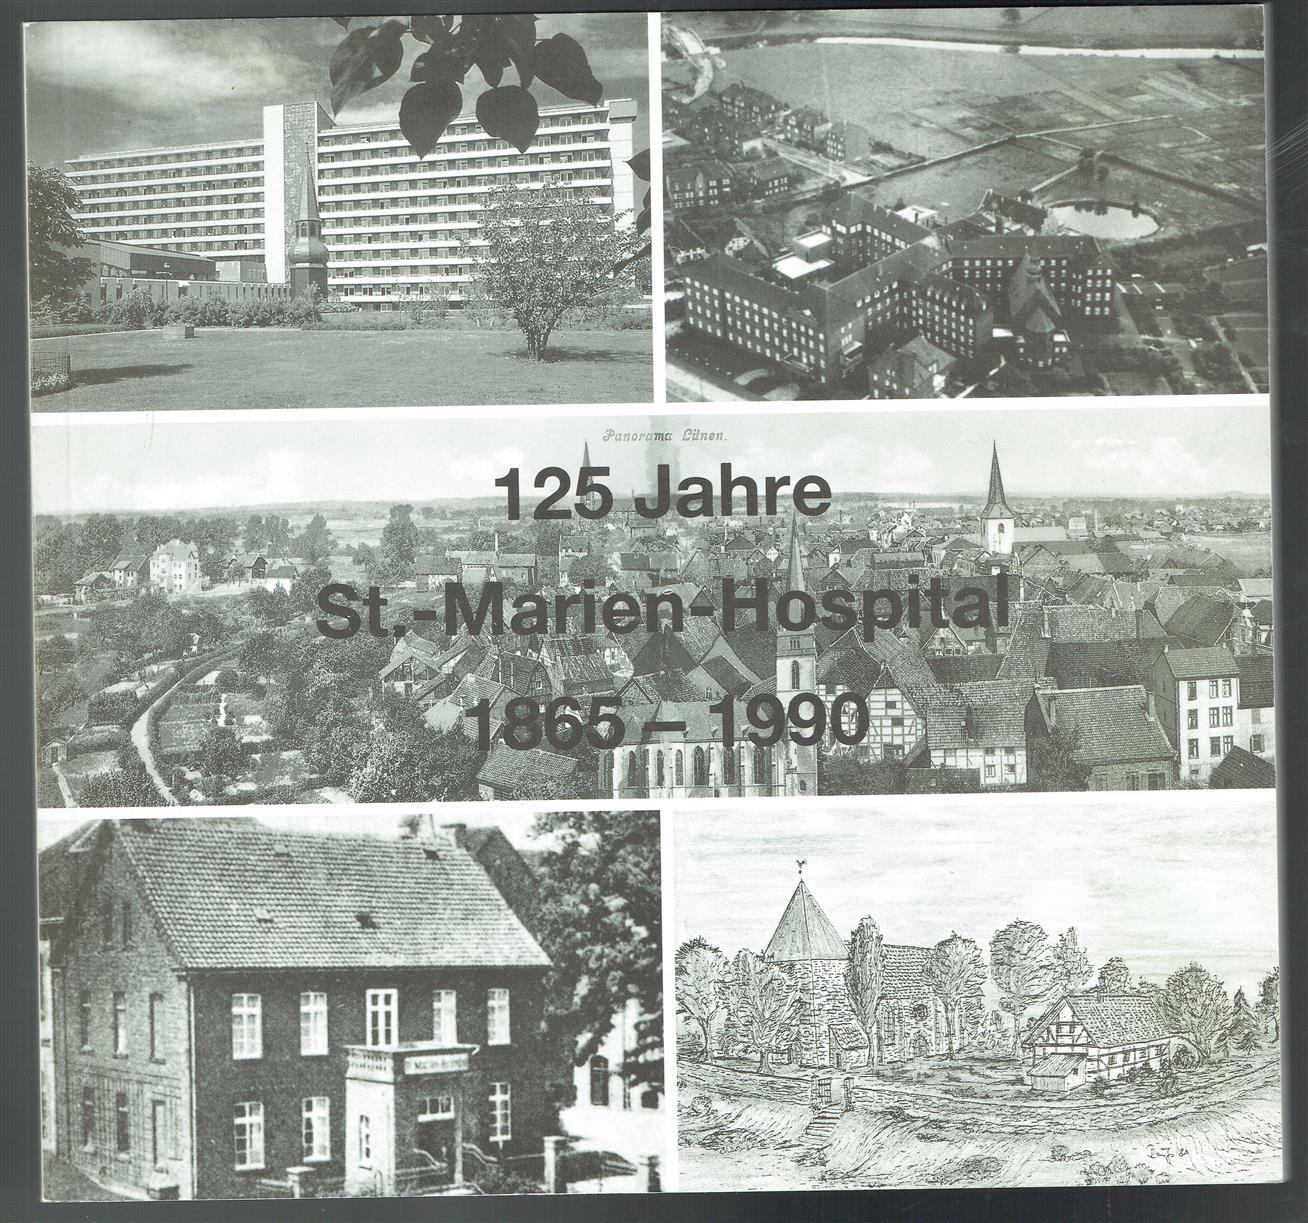 125 Jahre St.-Marien-Hospital Lünen 1865-1990